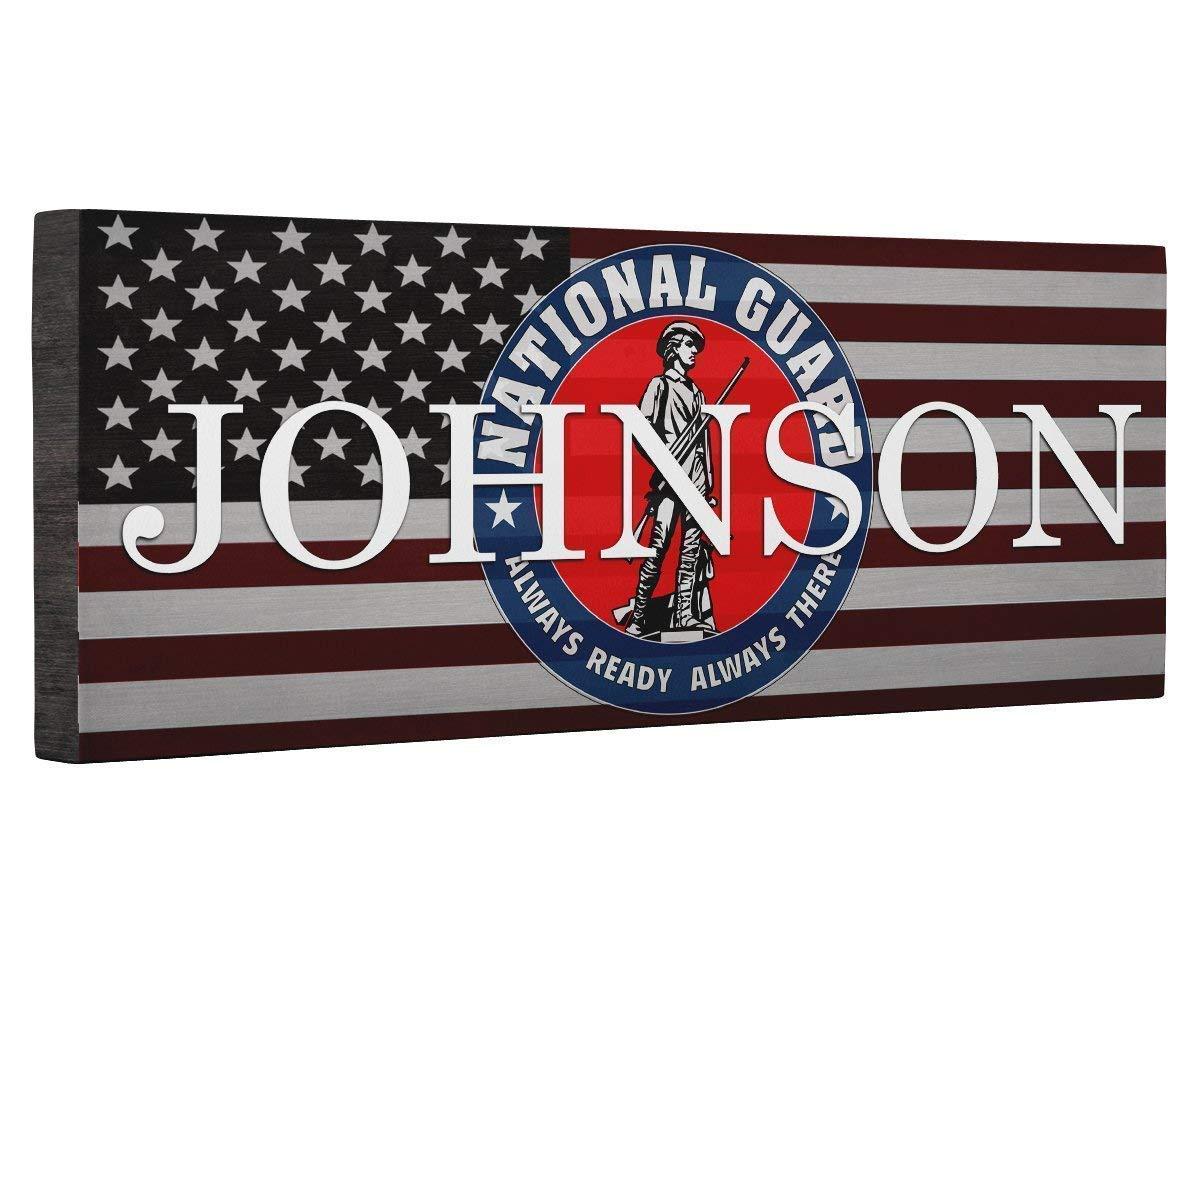 Hero National Guard Flag CANVAS Home D cor